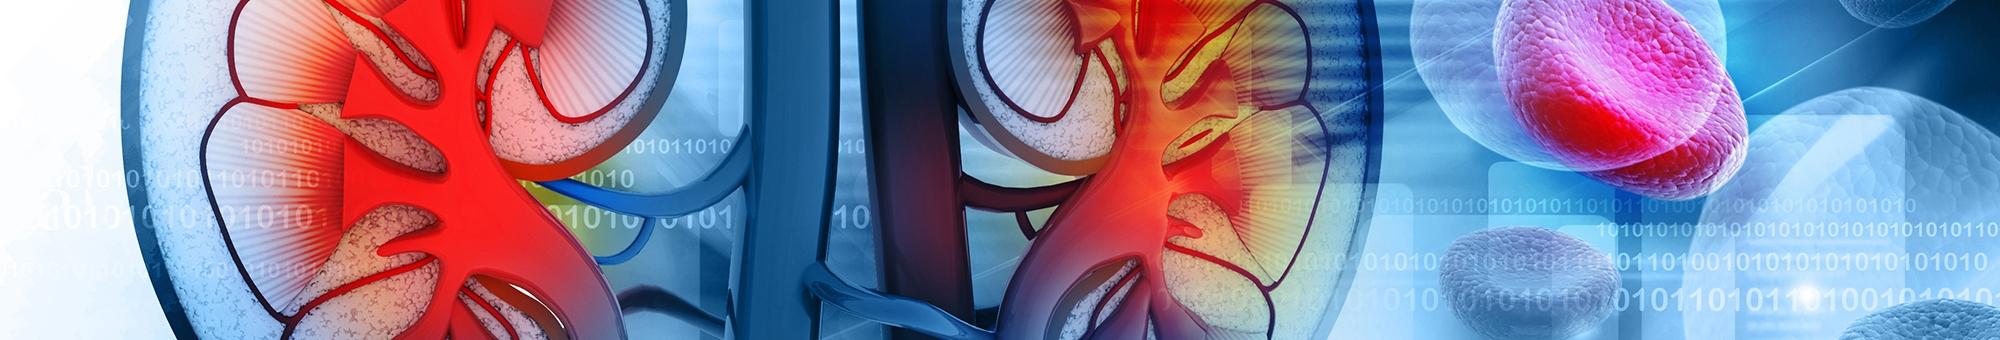 Nephrology - Specialized - Treatment